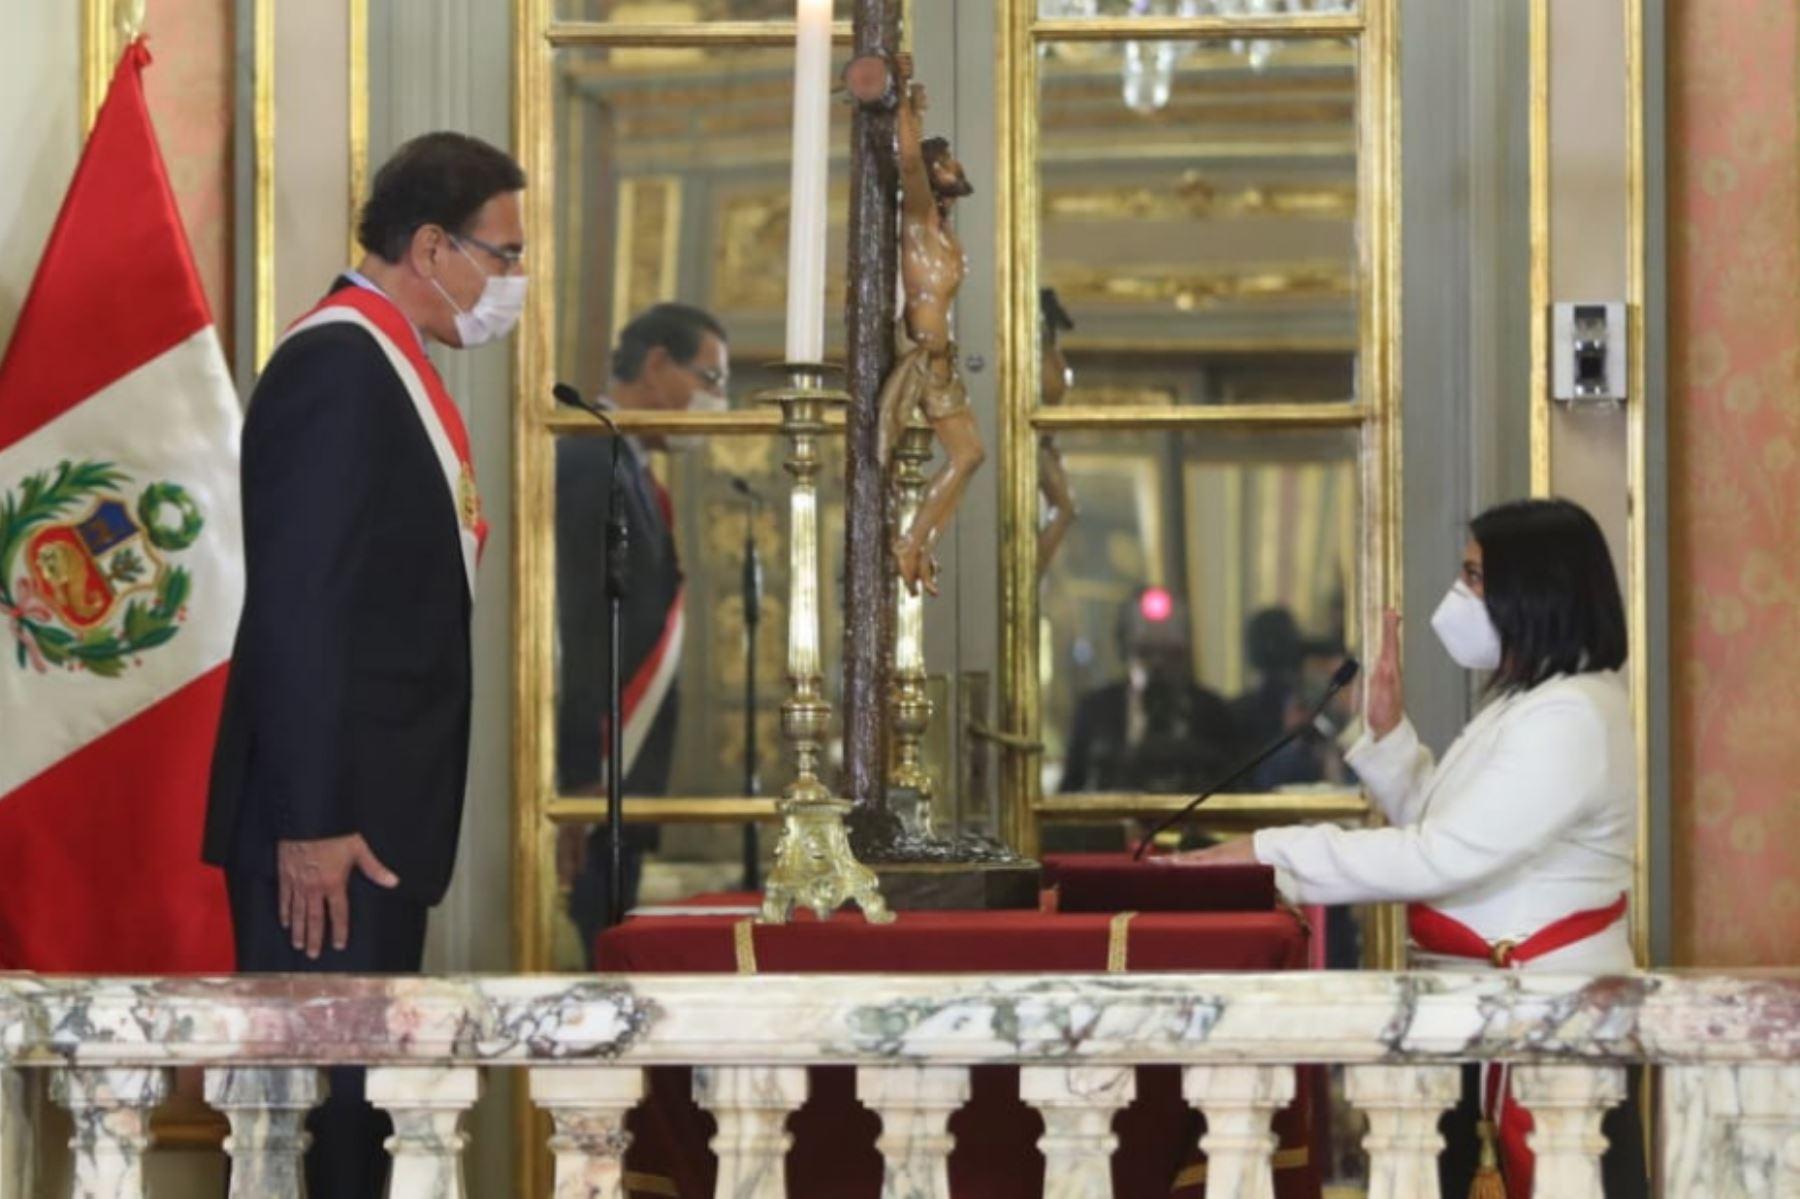 El presidente de la República, Martín Vizcarra, toma juramento a Ana Neyra como ministra de Justicia.  Foto: ANDINA/ Prensa Presidencia